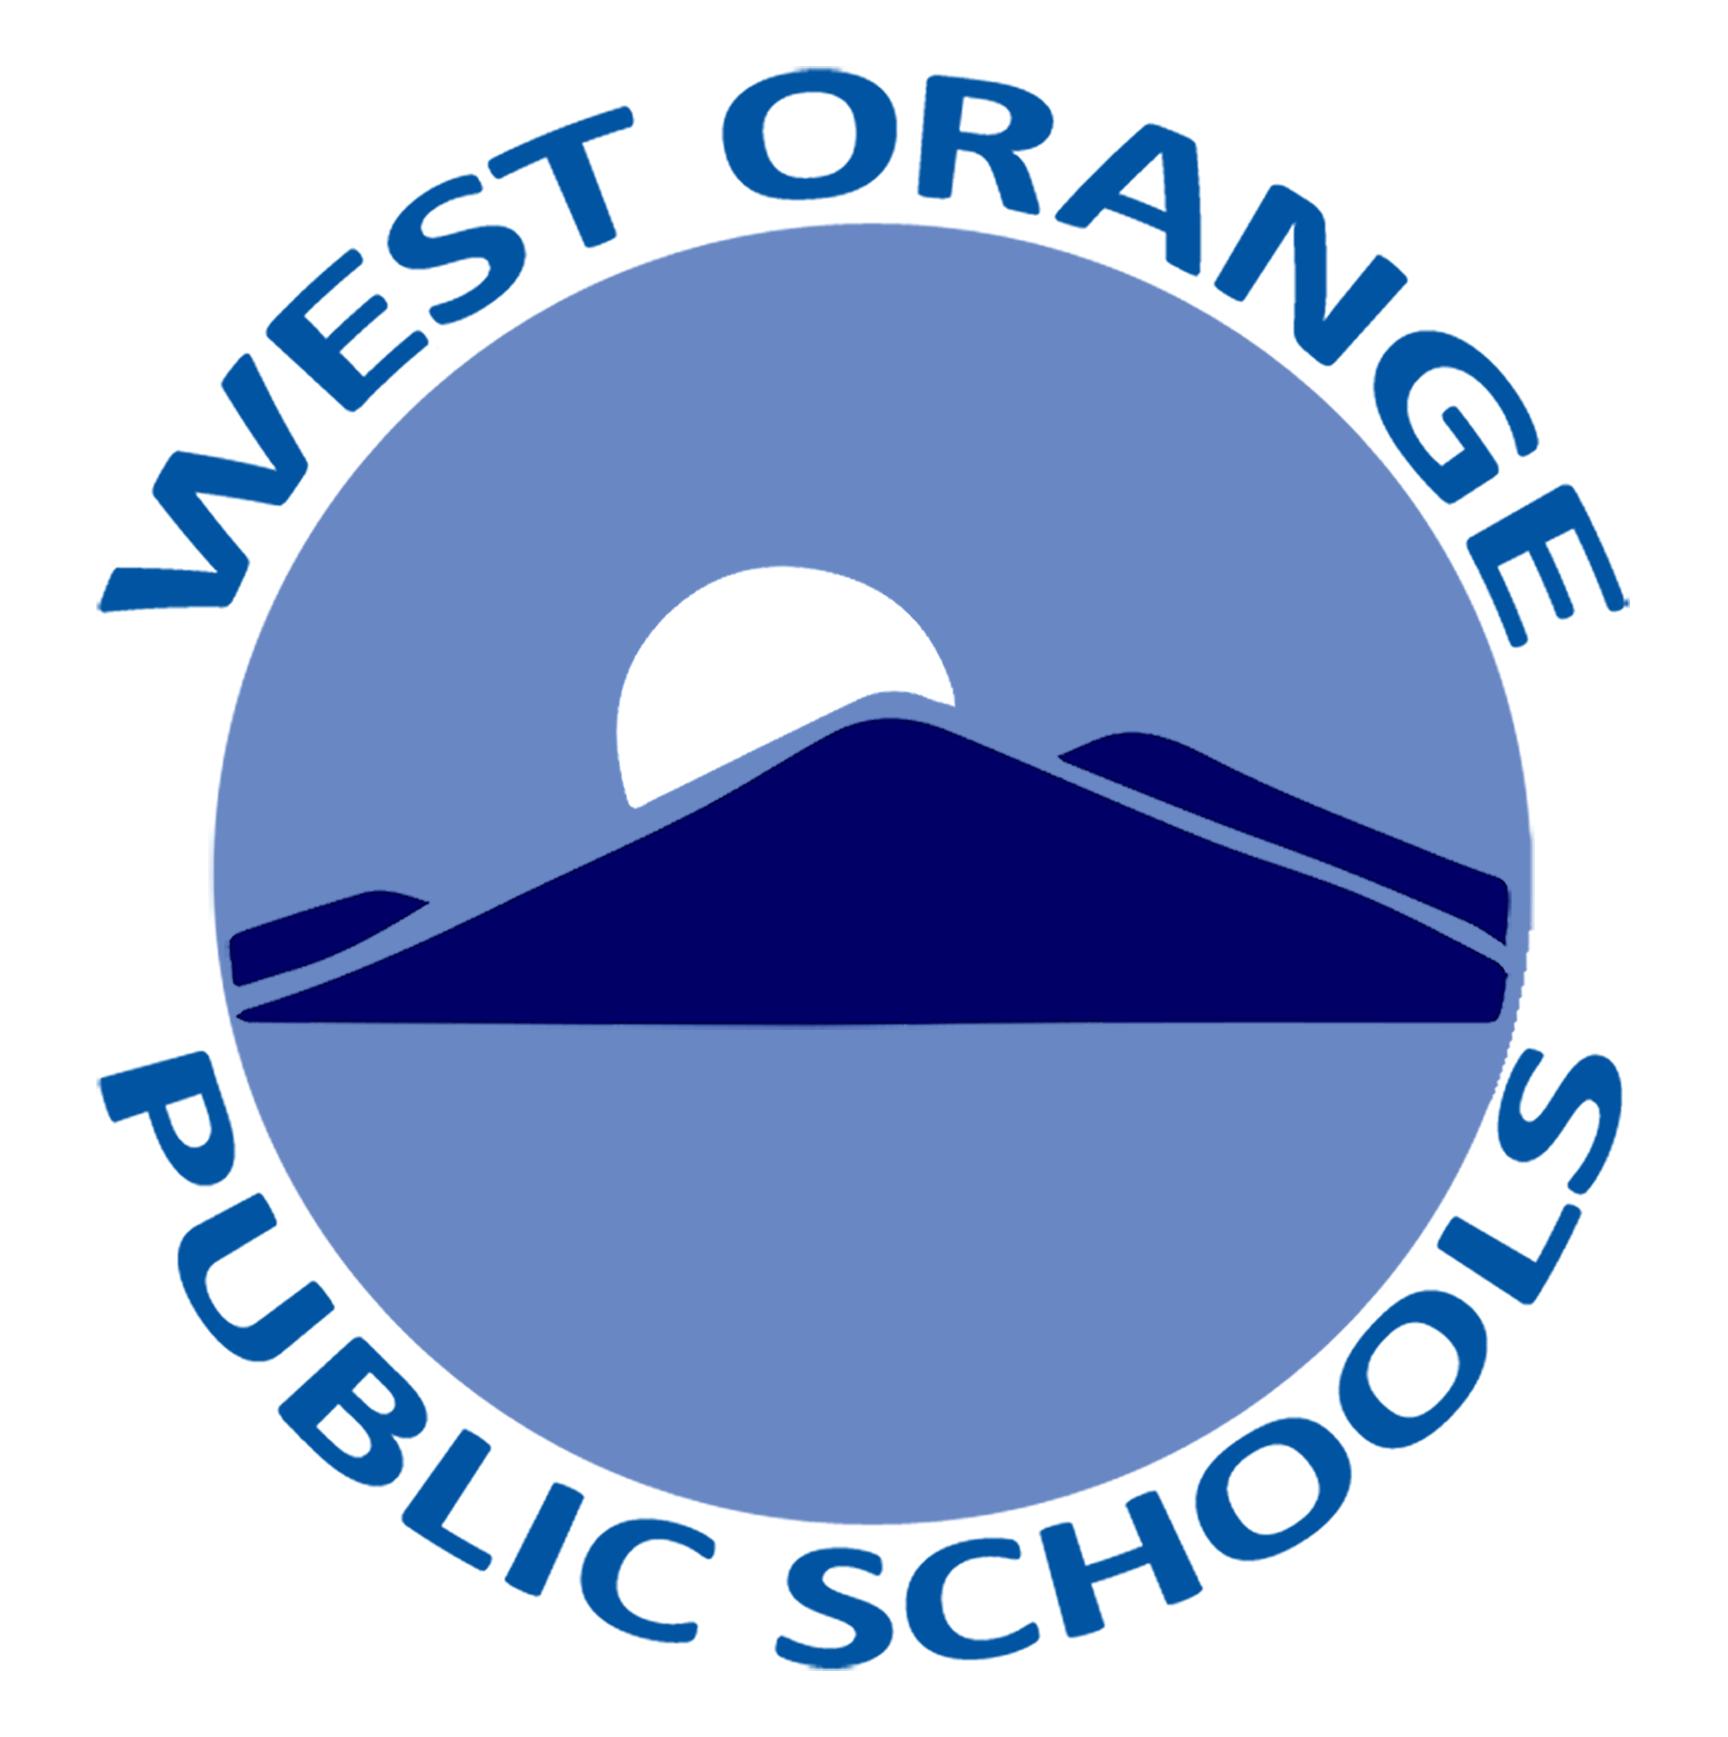 15e2e4fbc694d5d6a297_West_Orange_Public_Schools_Logo.jpg